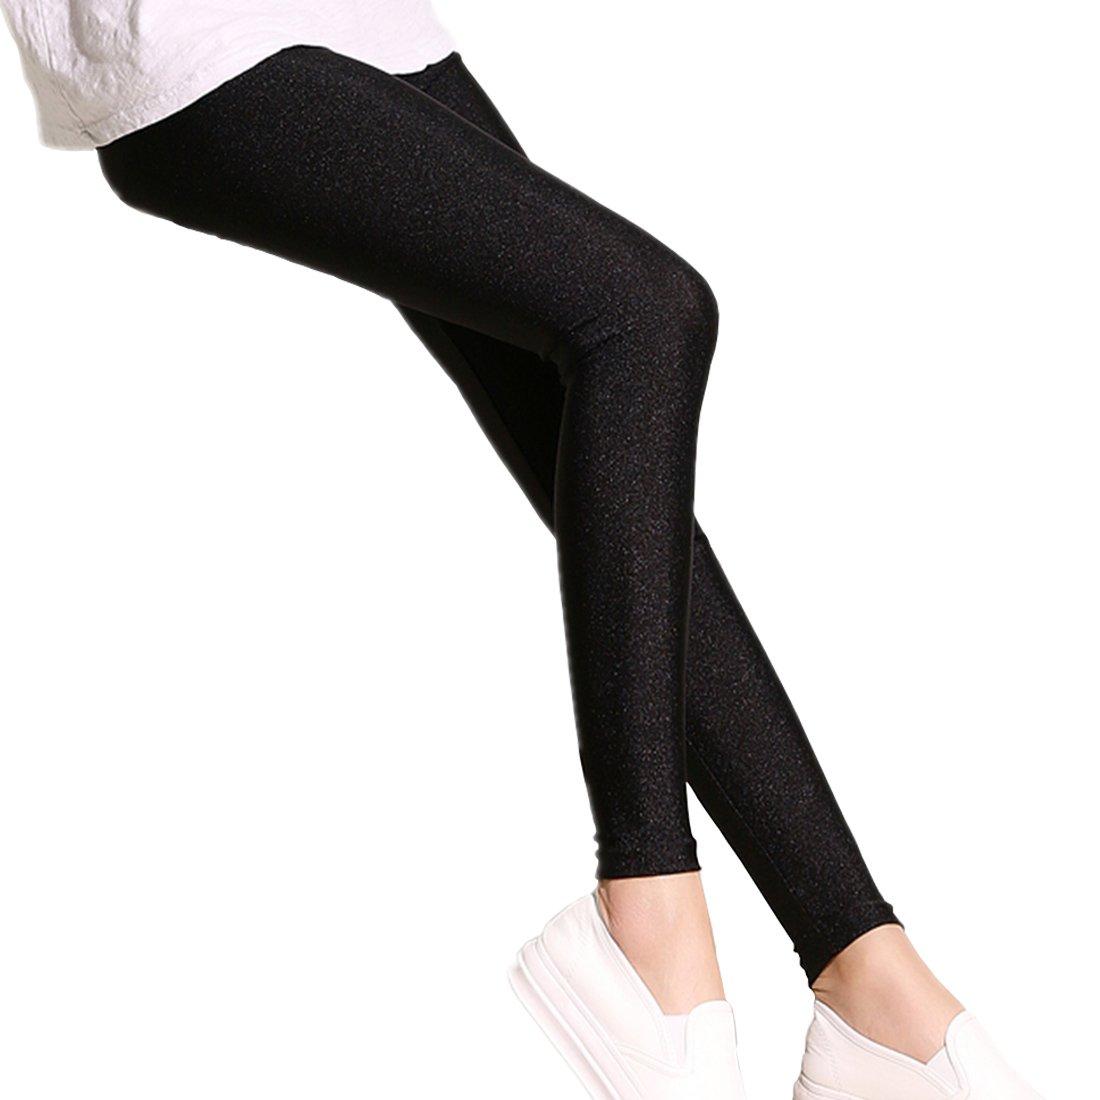 Weigou Women Leggings Spring Summer Autumn Shiny Thin Slim Tights Stretch Basic Lady Leggings Pantyhose Pants (XL, Black)